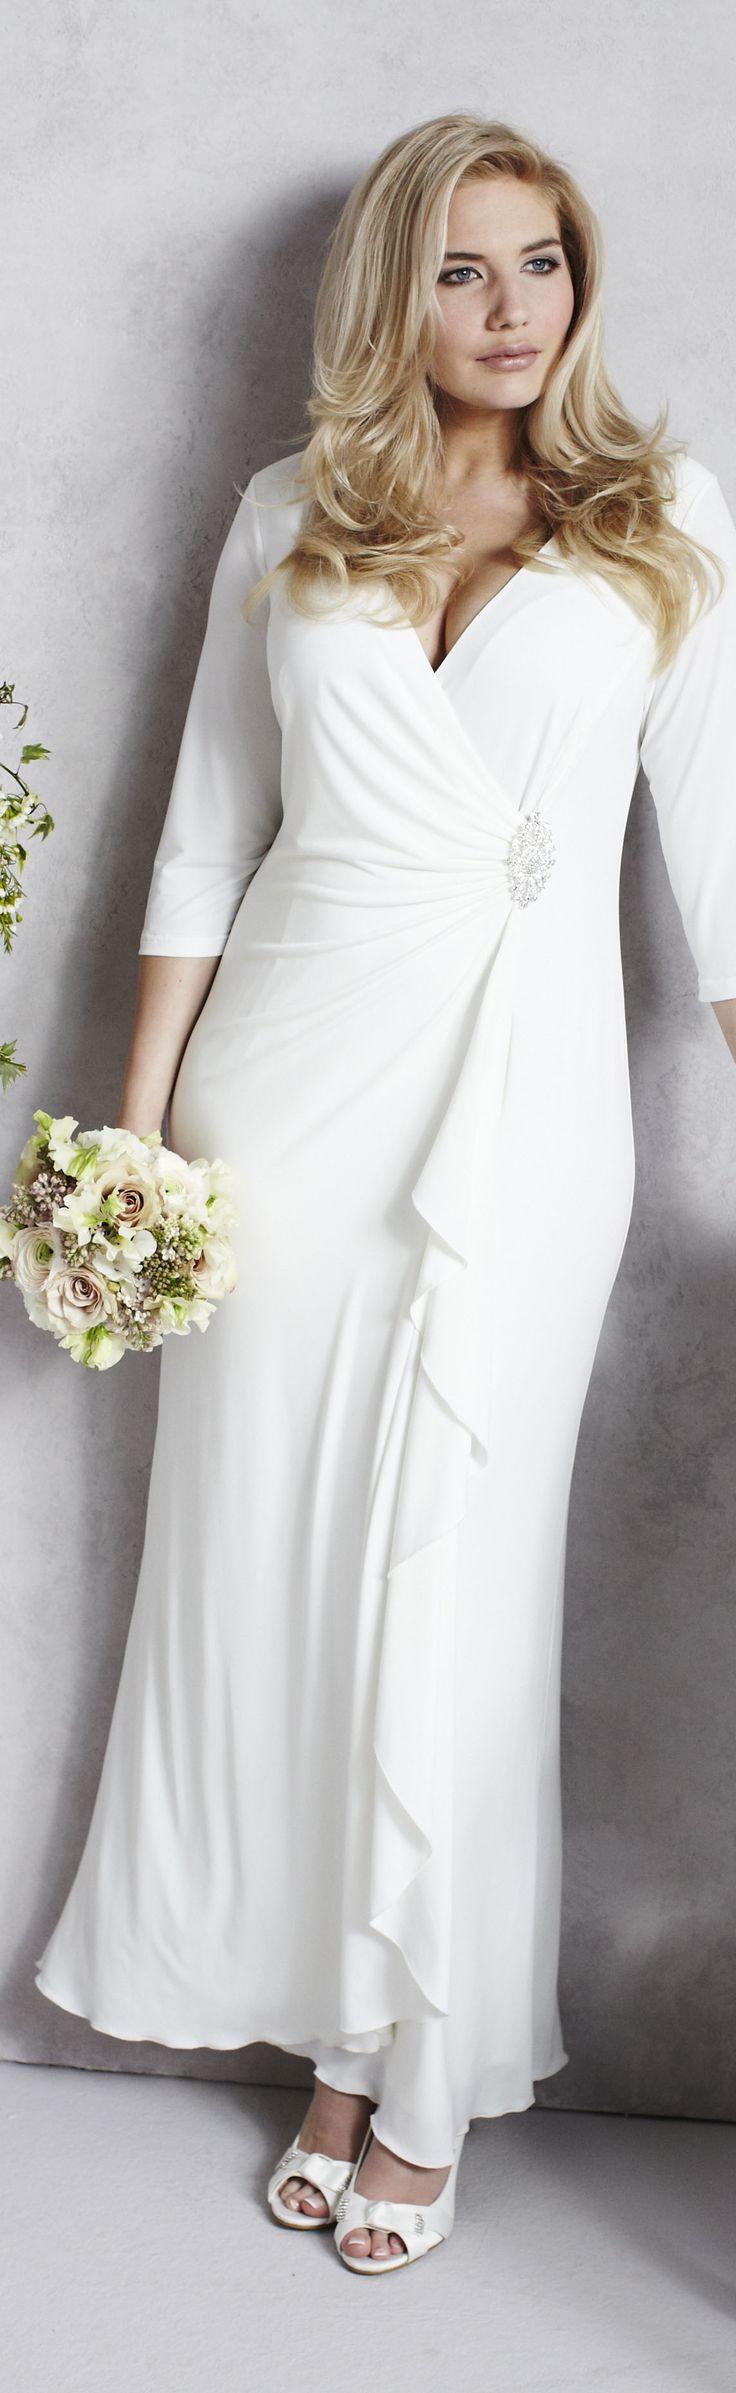 25+ best ideas about Second weddings on Pinterest   Second wedding ...